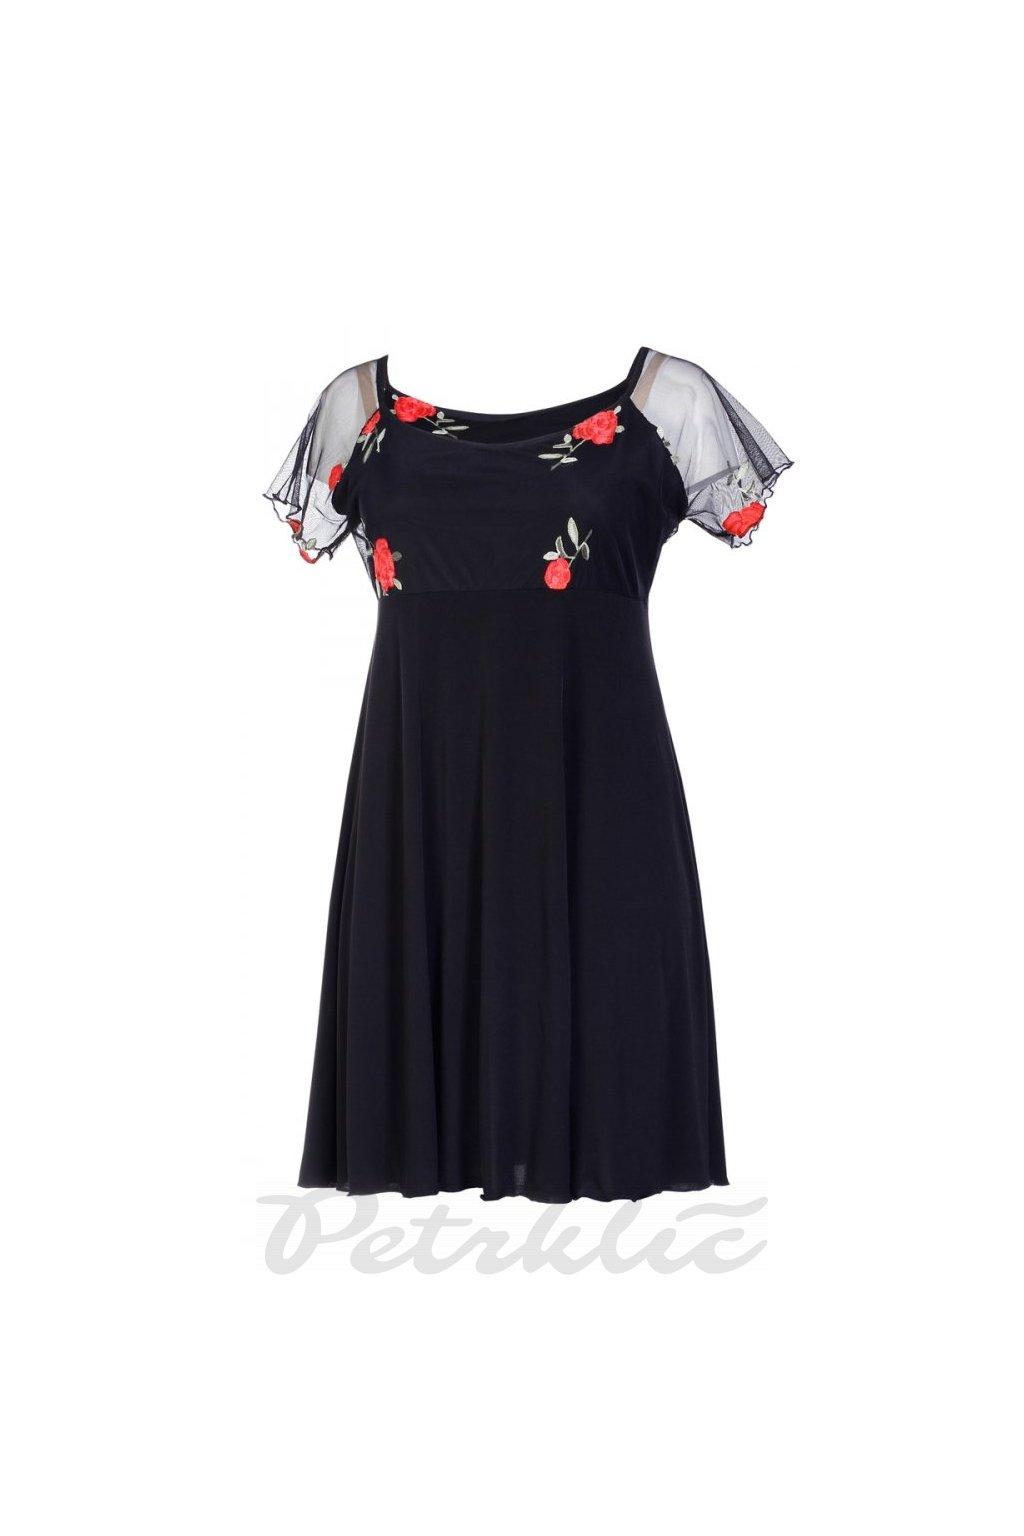 AGÁTA šaty 110 - 115 cm